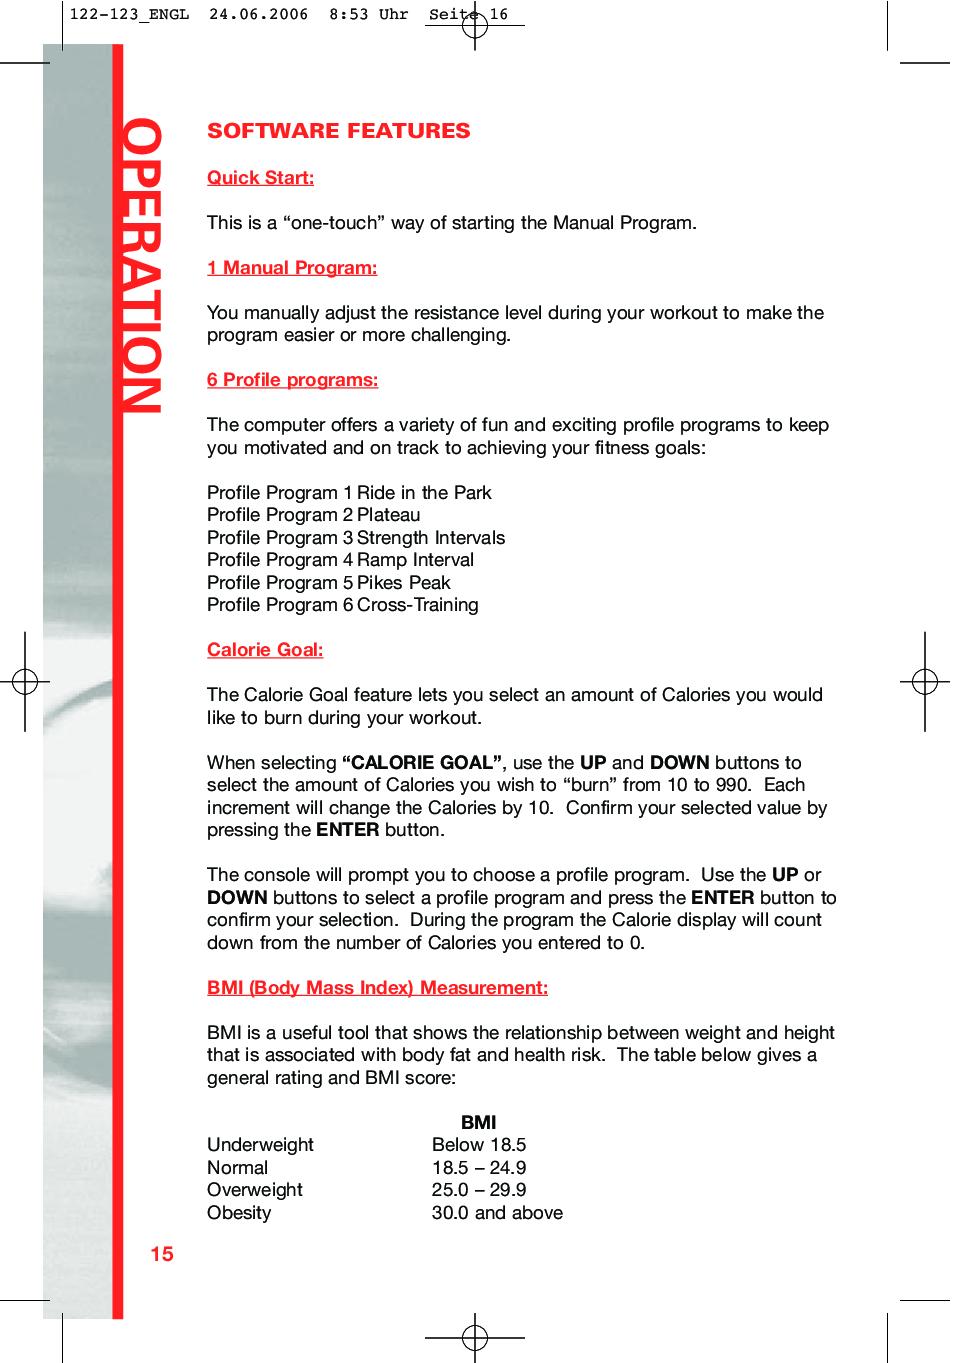 Schwinn Fitness 123 User Manual Manual Guide